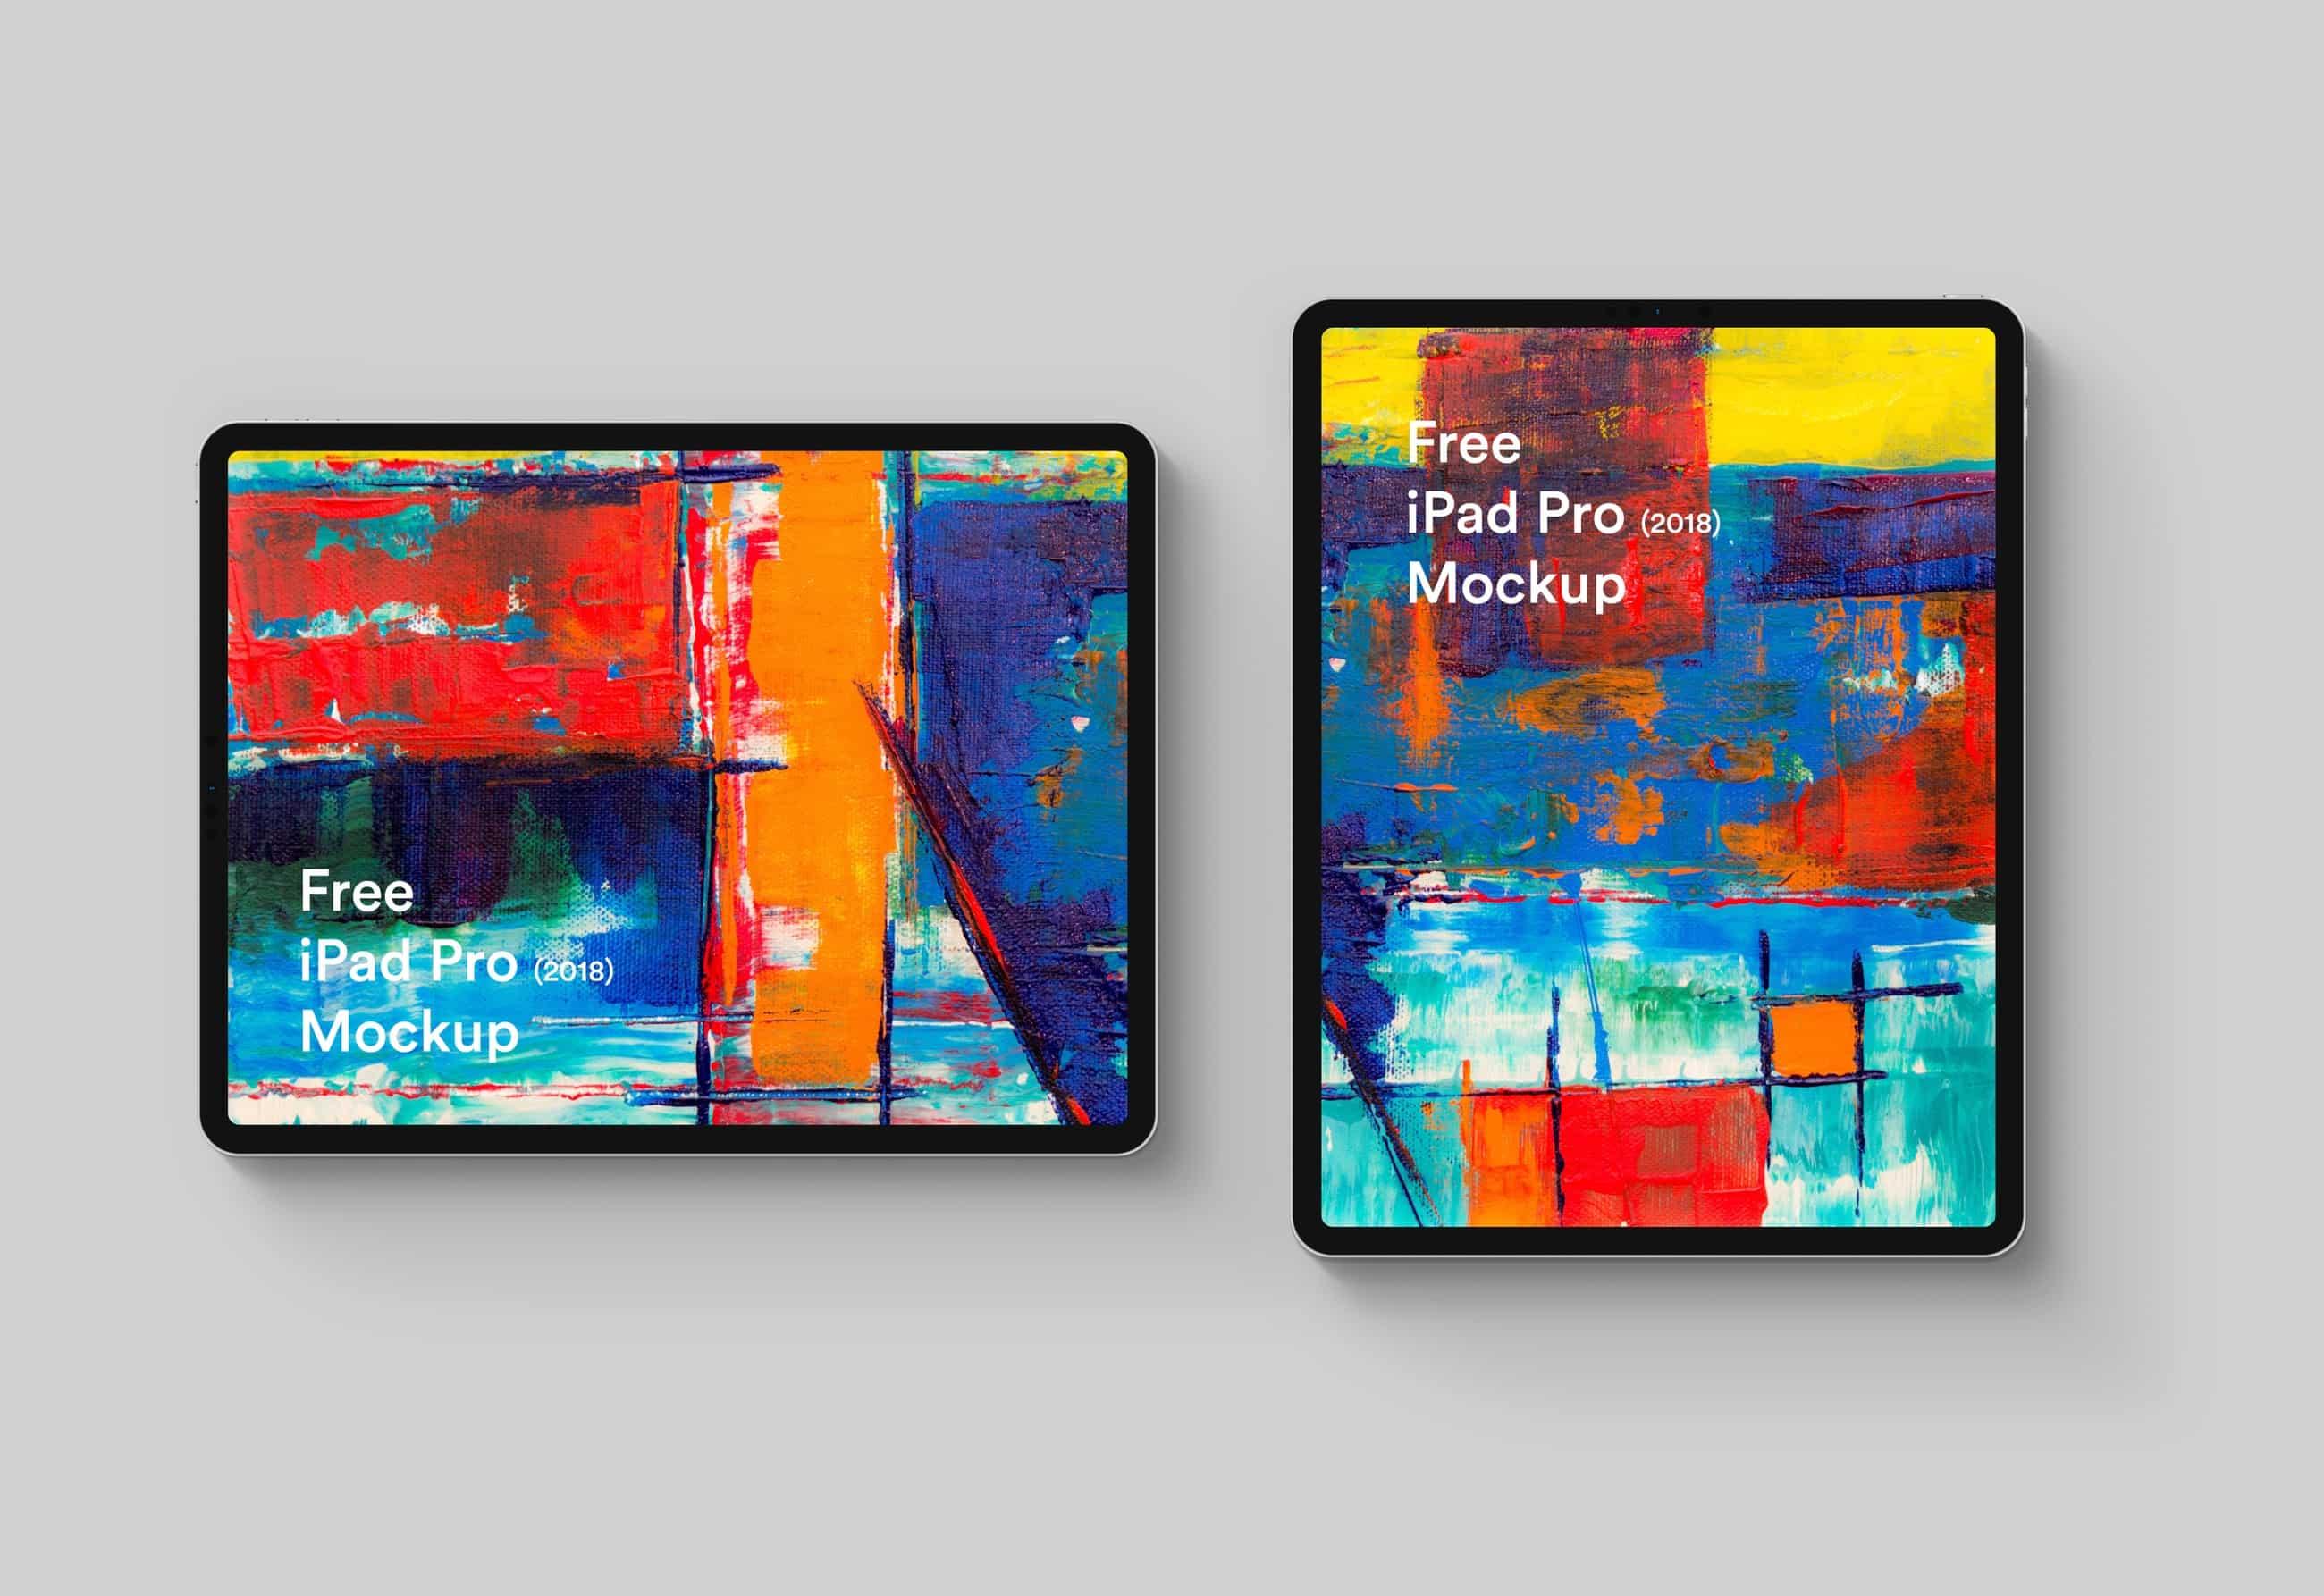 Free iPad Pro 2018 Mockup